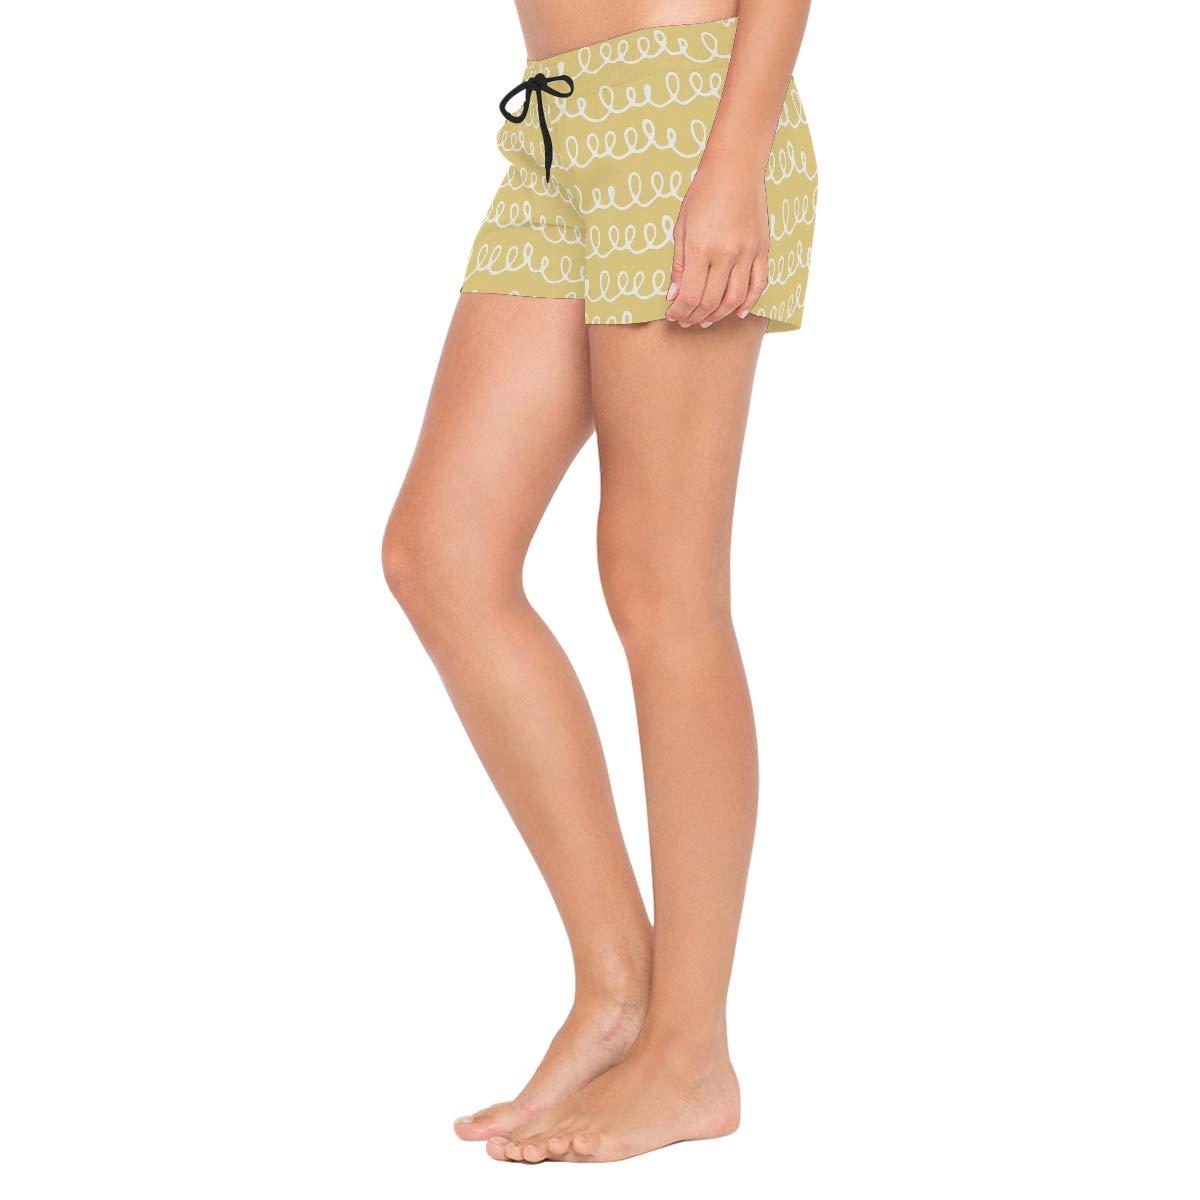 MALPLENA Womens Board Shorts Irregular Line Quick Dry Beach Boardshorts